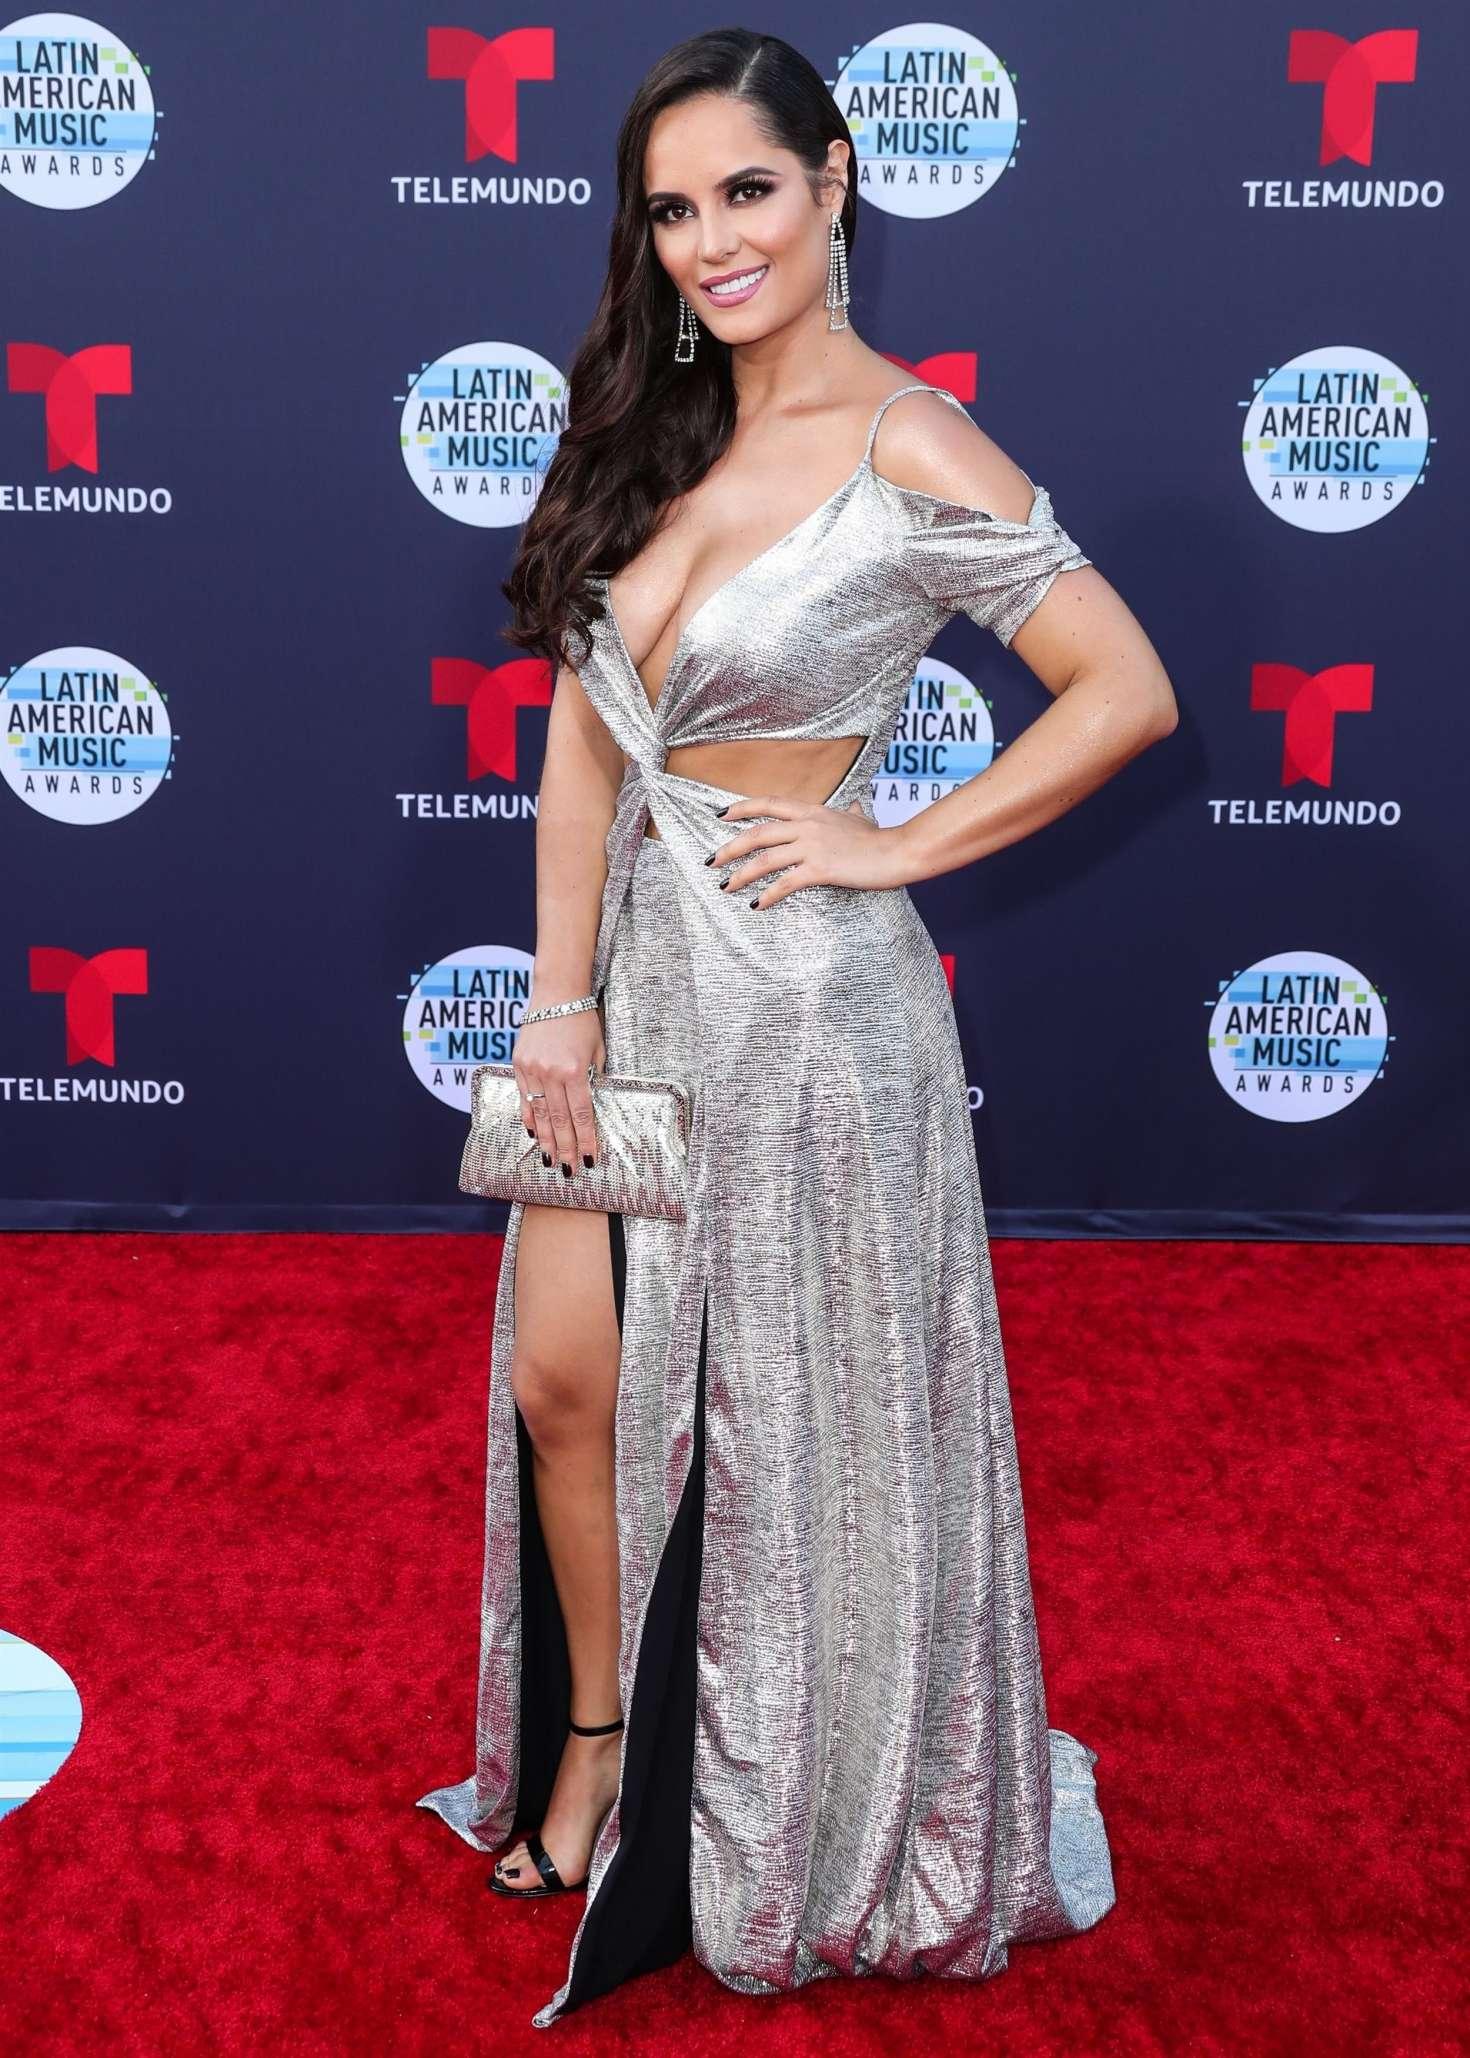 Ana Lucia Dominguez 2018 : Ana Lucia Dominguez: 2018 Latin American Music Awards -04